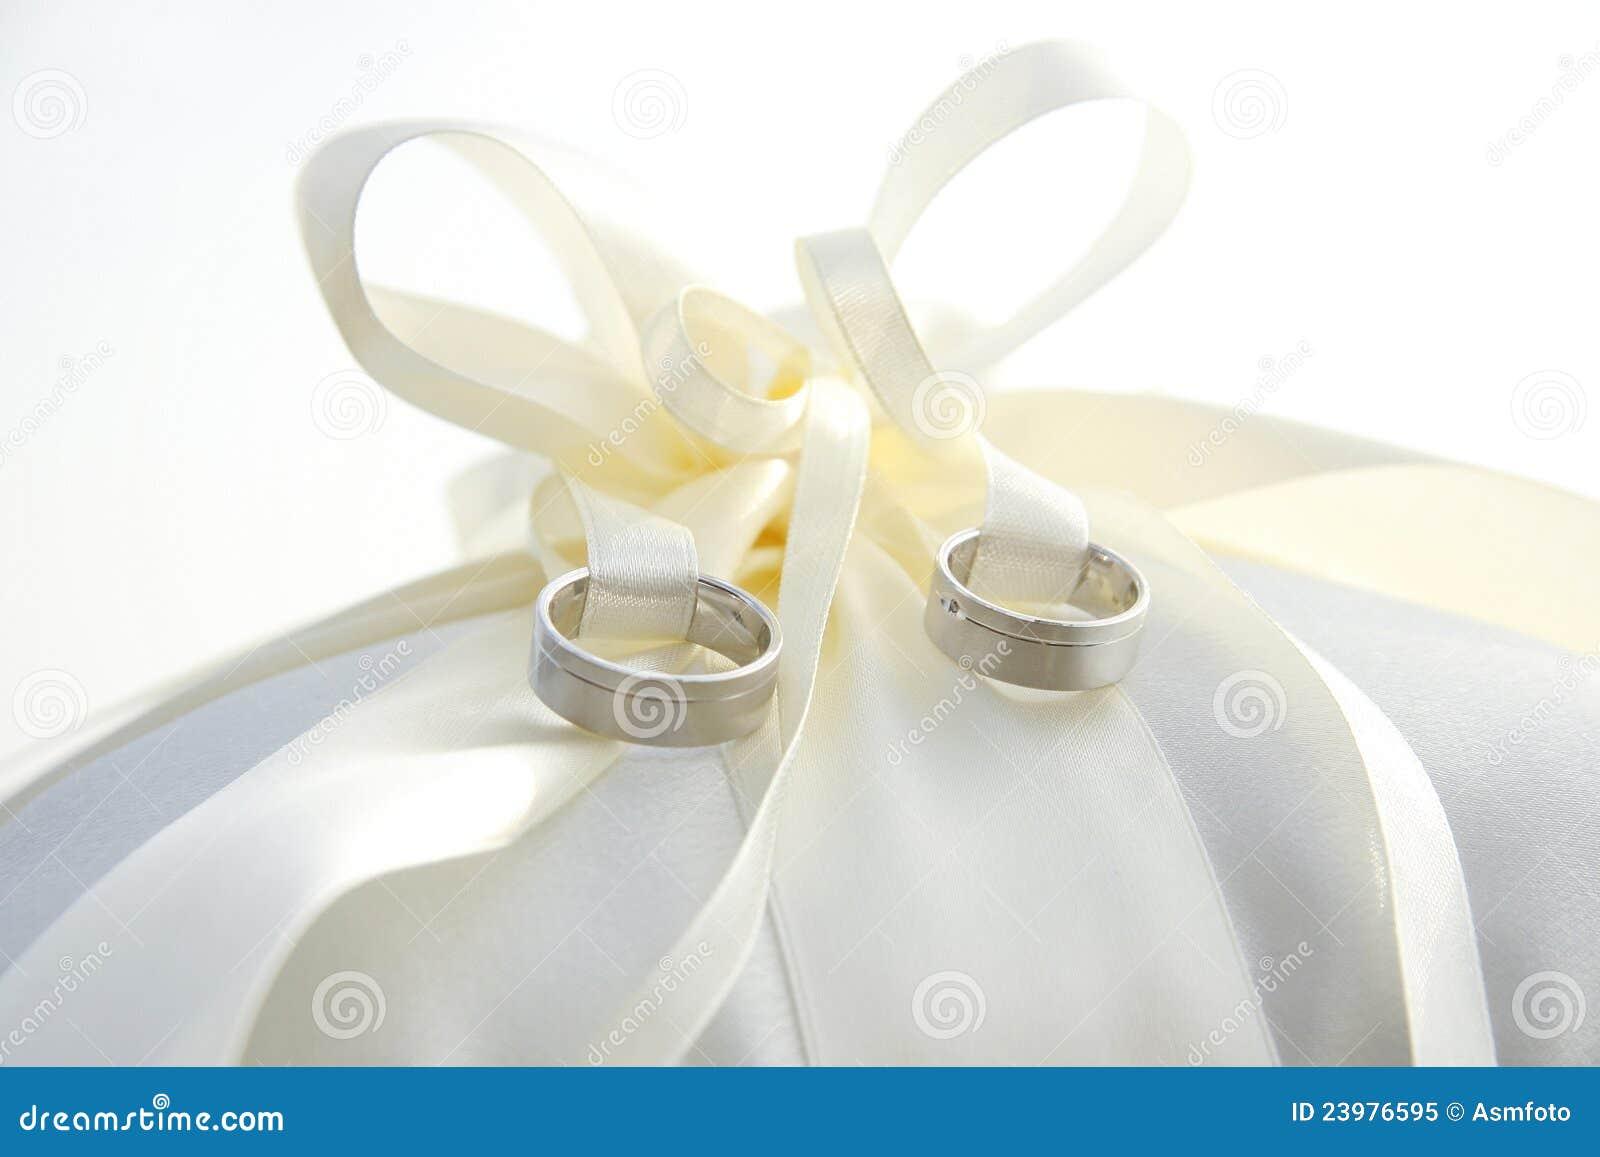 anne holder ivory ring engagement pillow index oreiller wedding new ios cushion